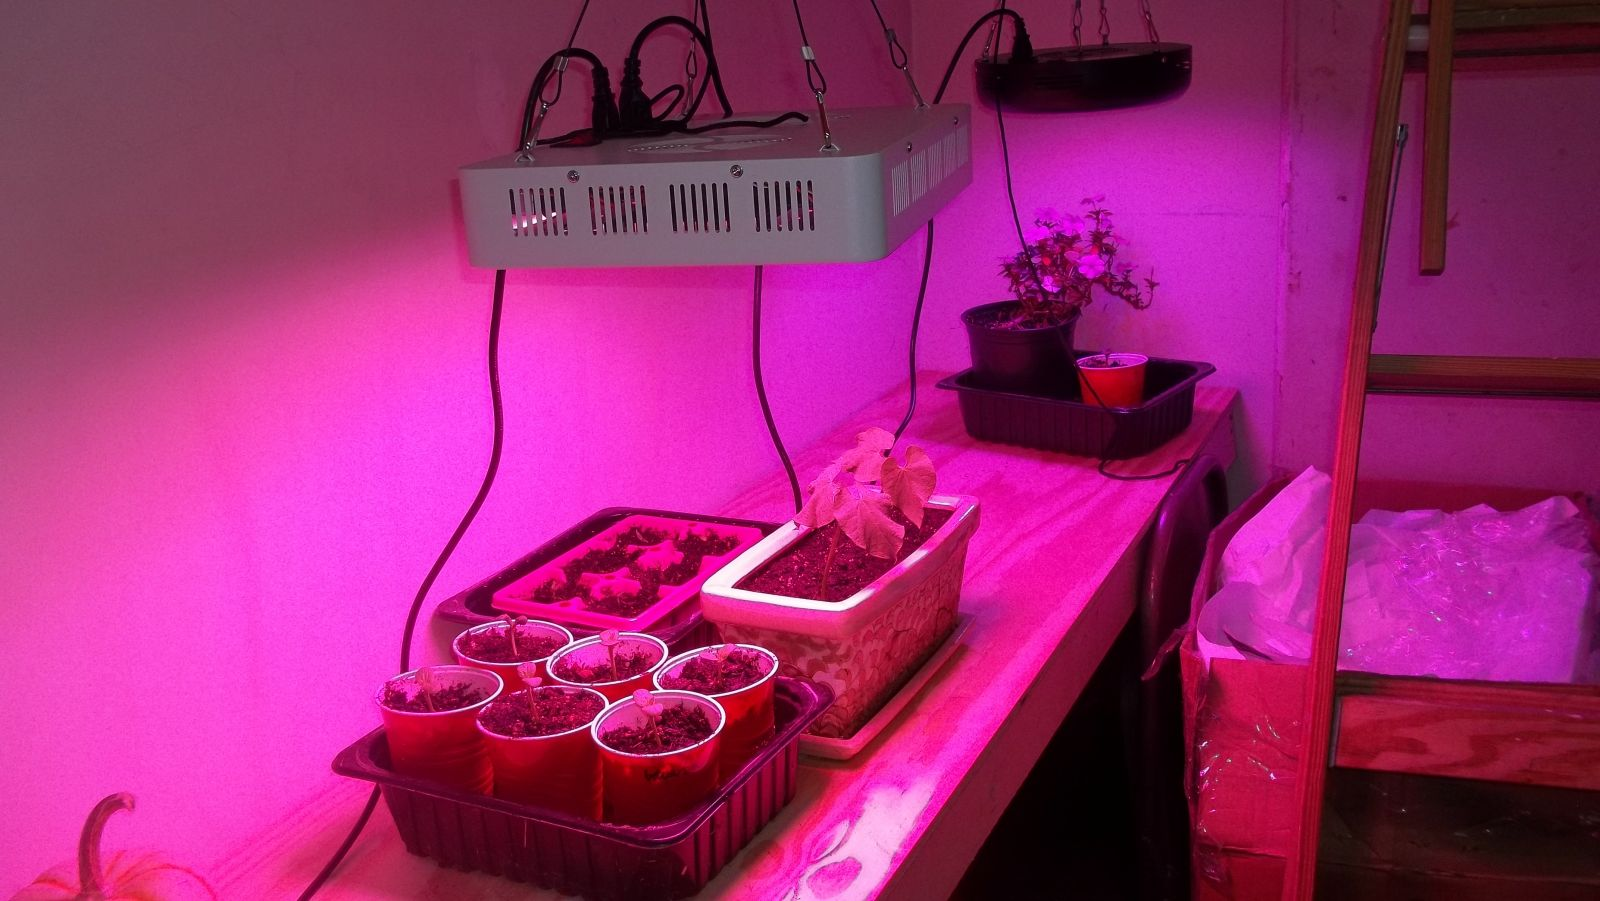 Review: HIGROW 2000 watt LED Grow Light | Tomorrow's Garden